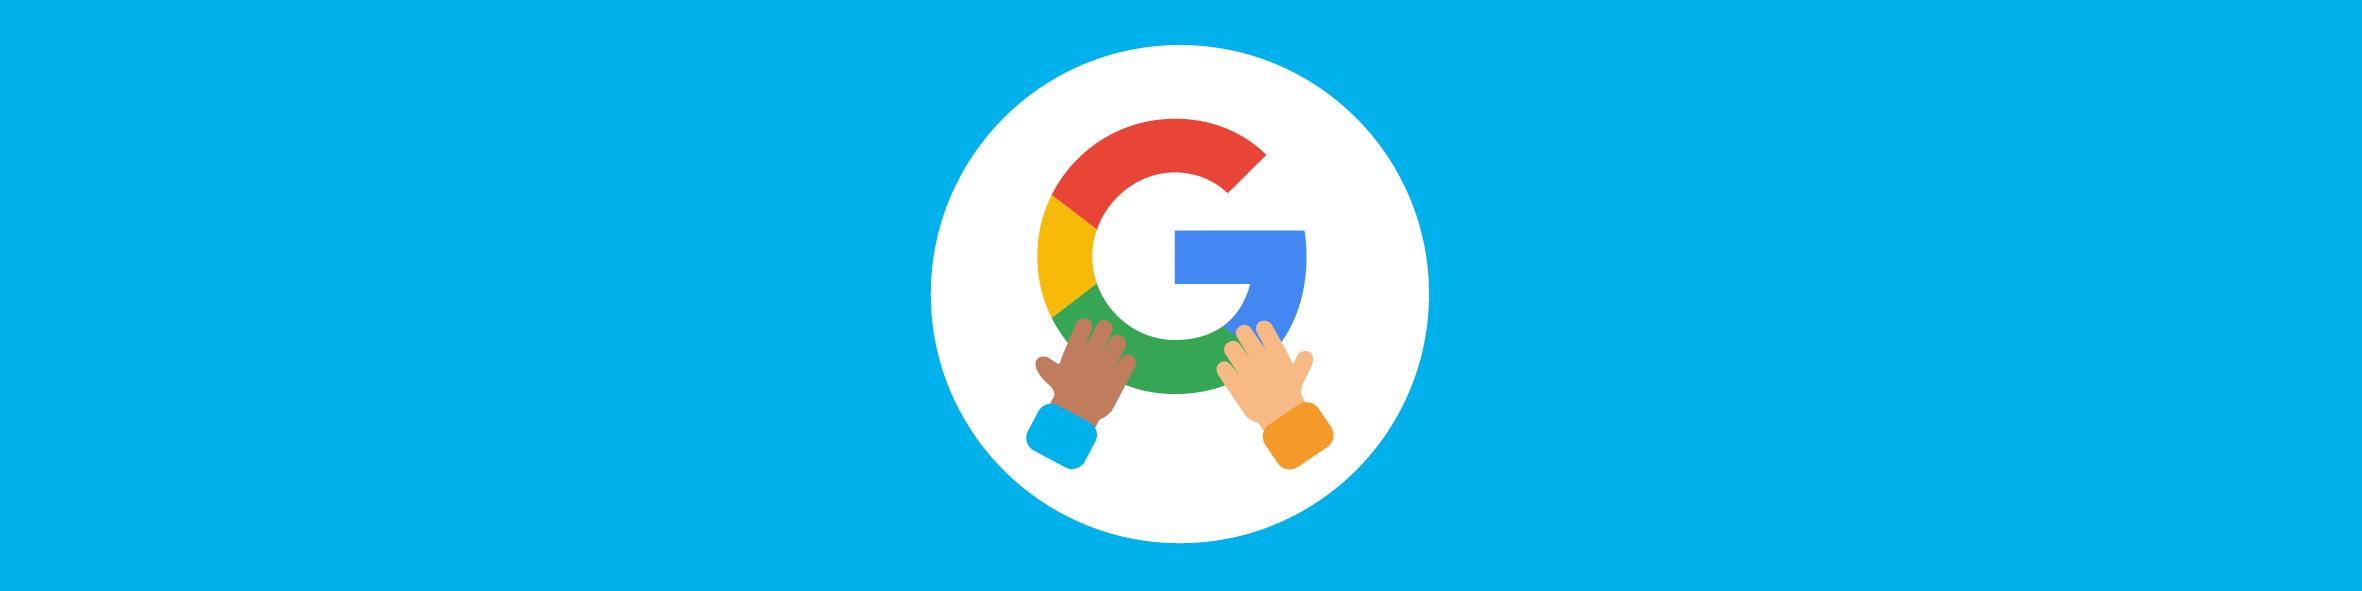 Efficient werken met Google - Cloudwise Academy header trainingsaanbod